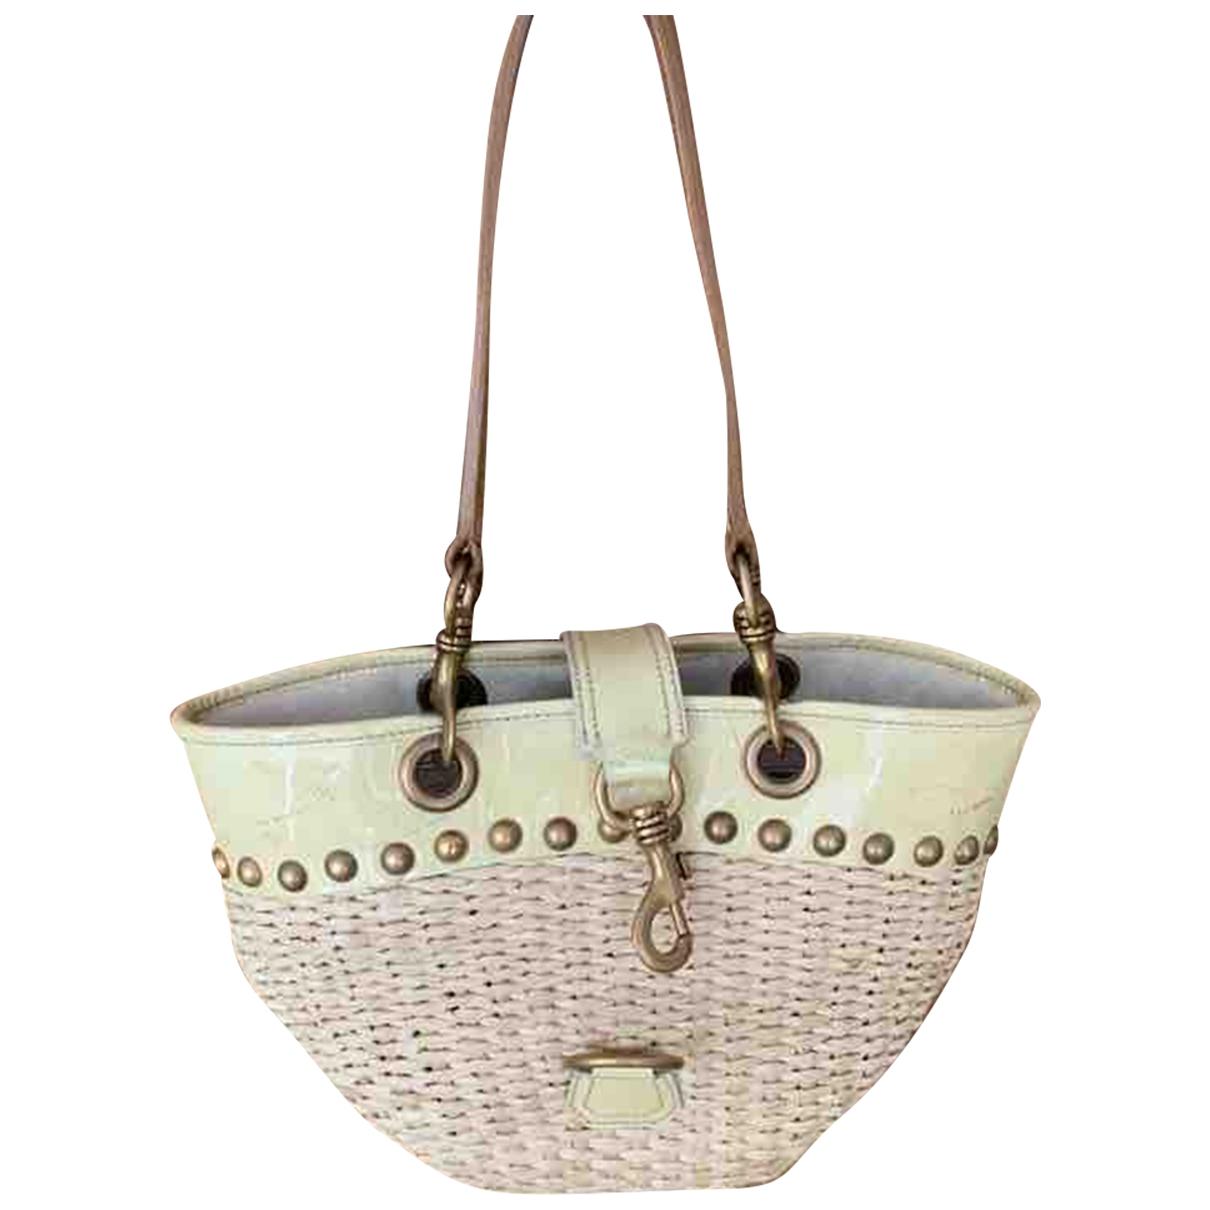 Miu Miu \N Beige Wicker handbag for Women \N